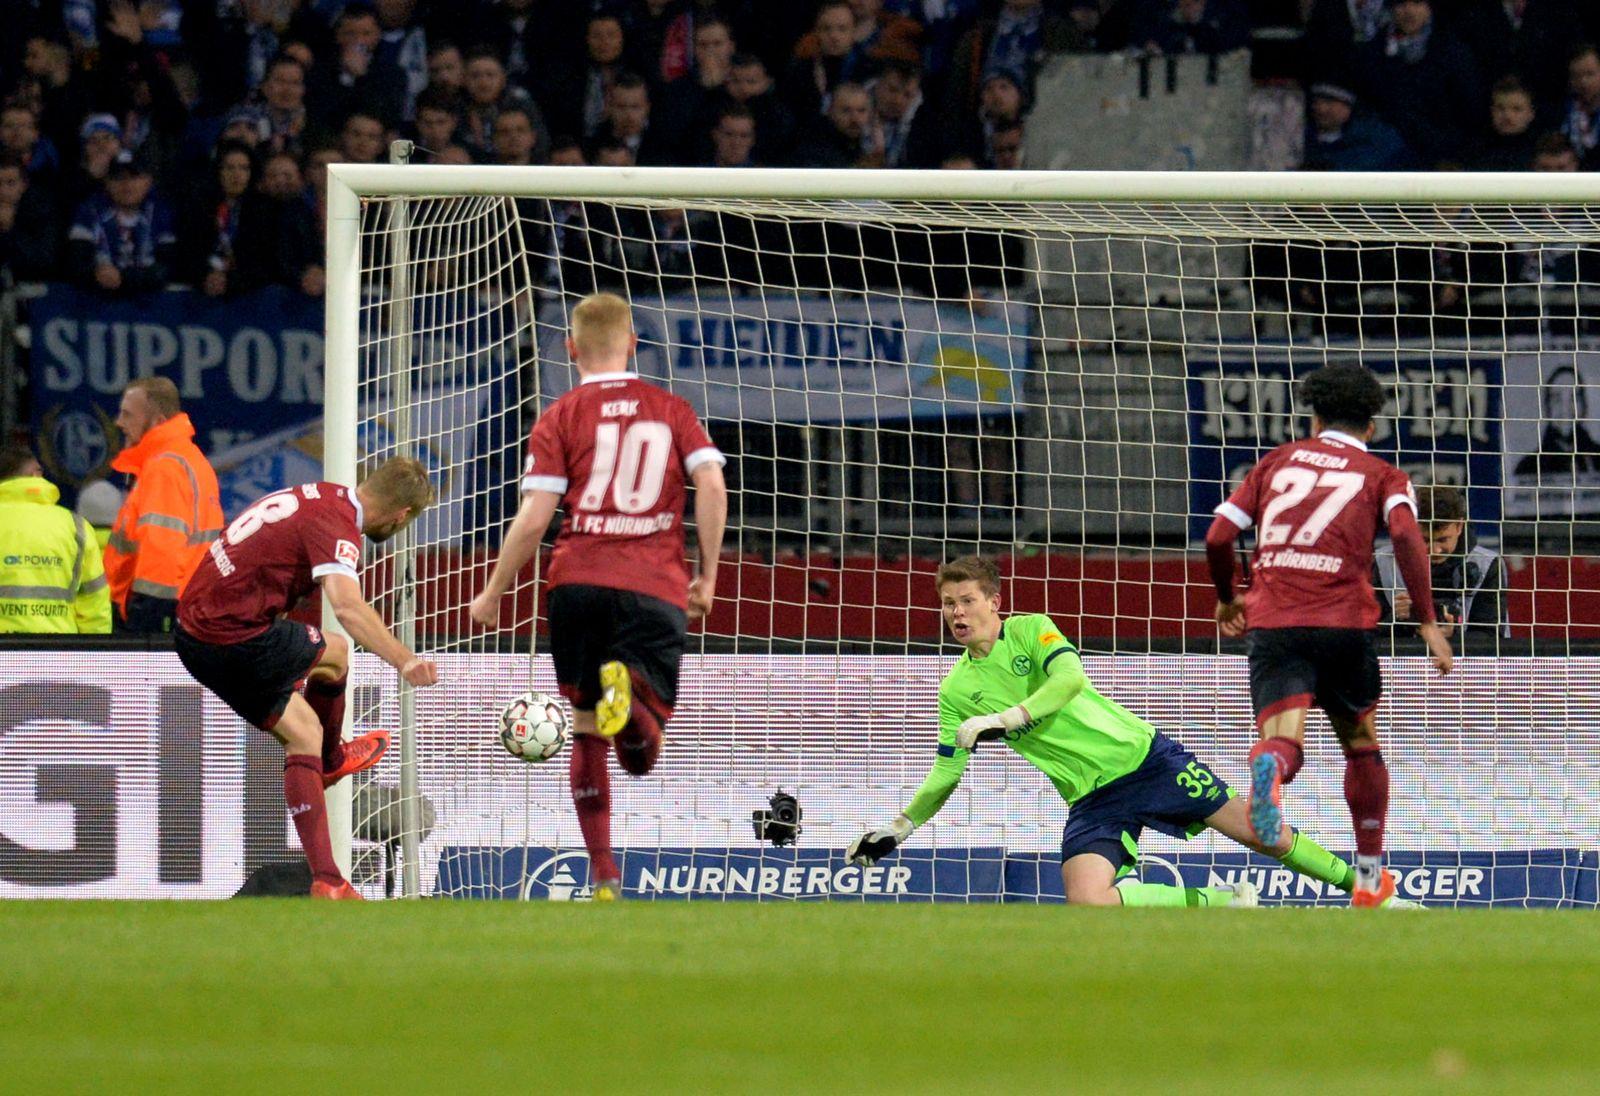 1. FC Nürnberg - FC Schalke 04 Behrens Nübel